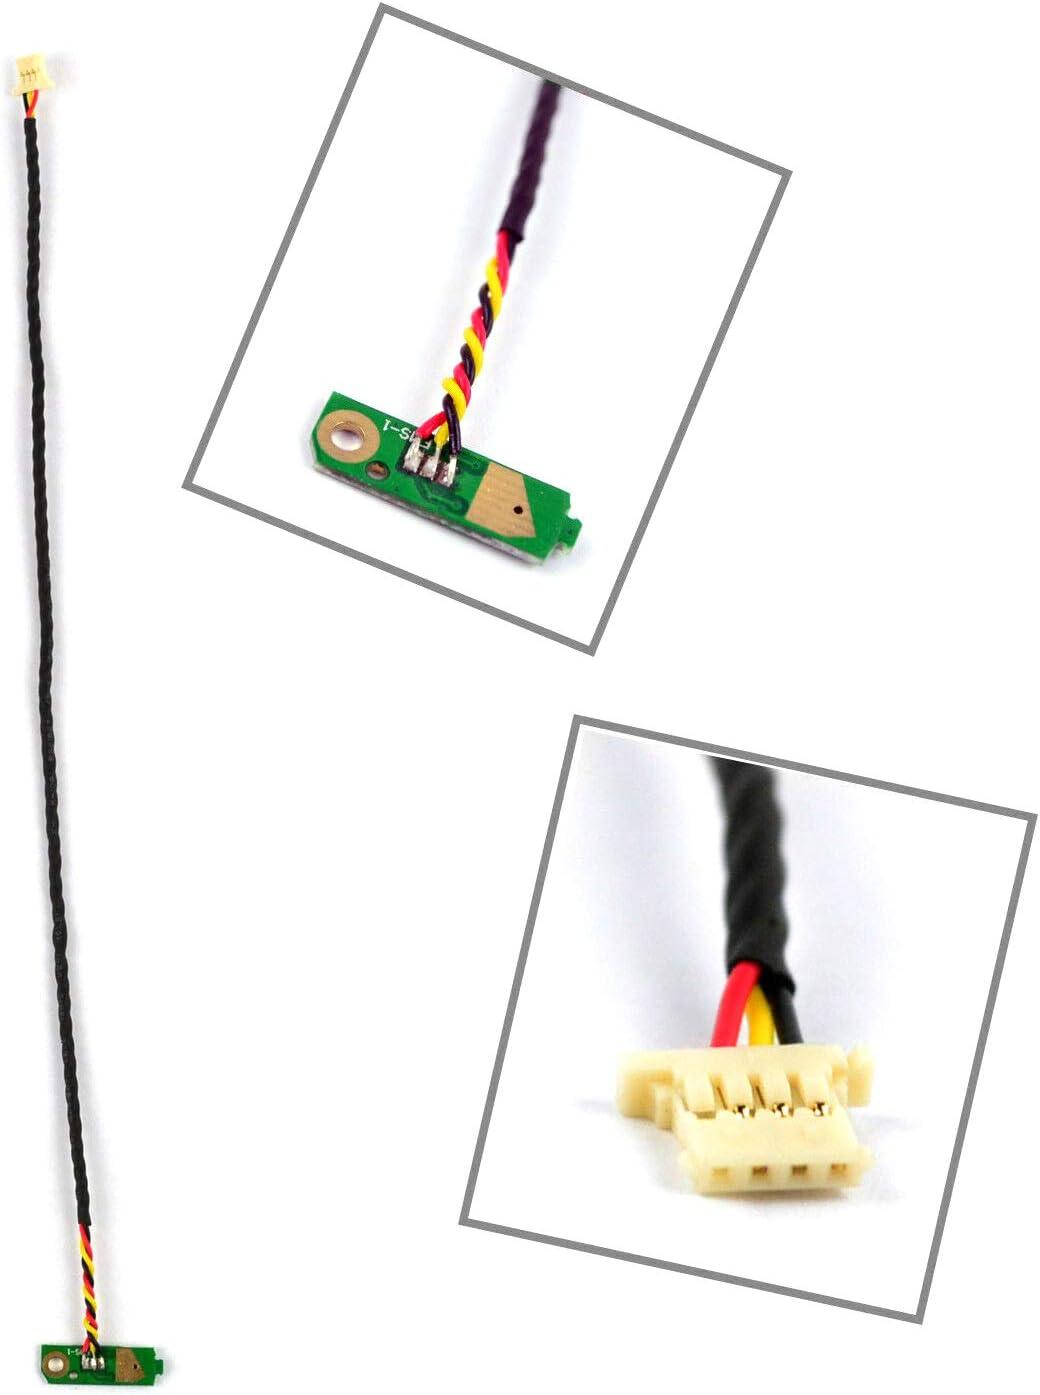 Power Button Board Connector Flex Cable Replacement Compatible with Dell Studio 1555 1557 1558 DD0FM8PB000 DD0FM8PB001